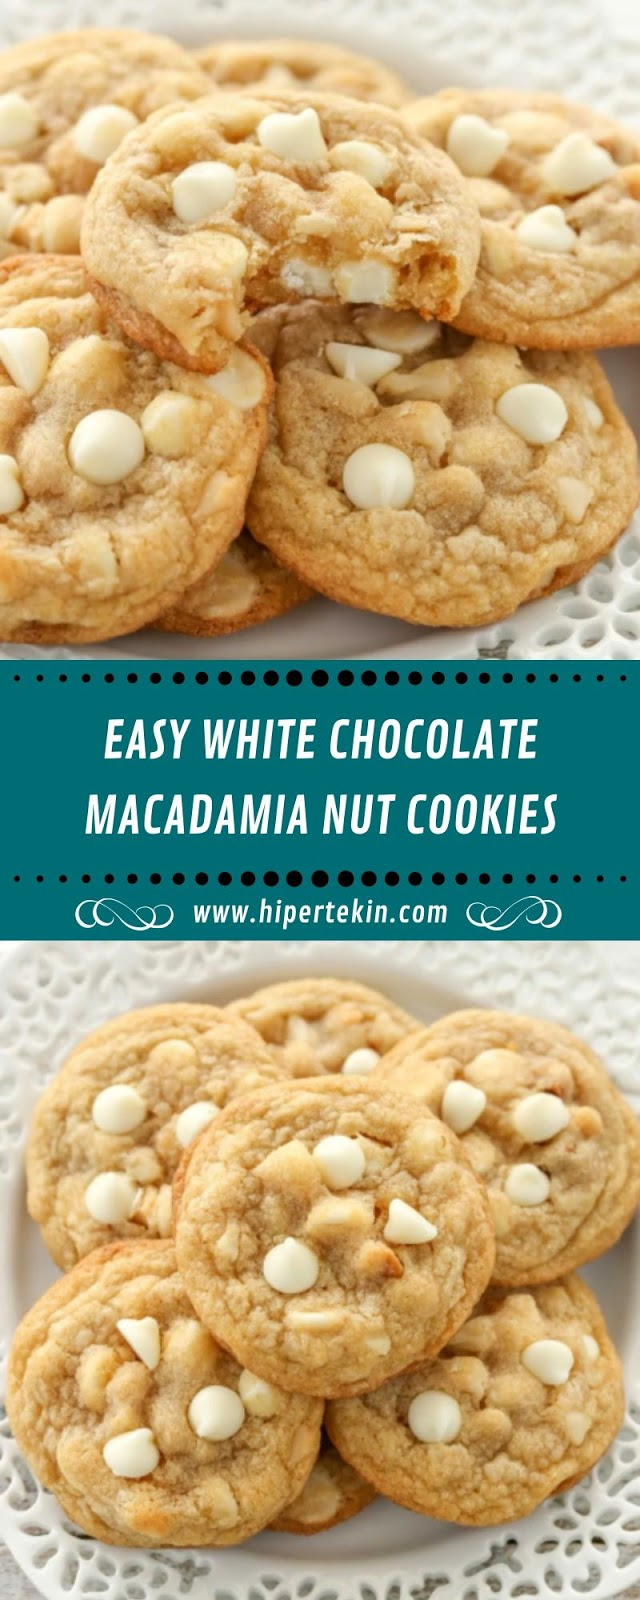 EASY WHITE CHOCOLATE MACADAMIA NUT COOKIES